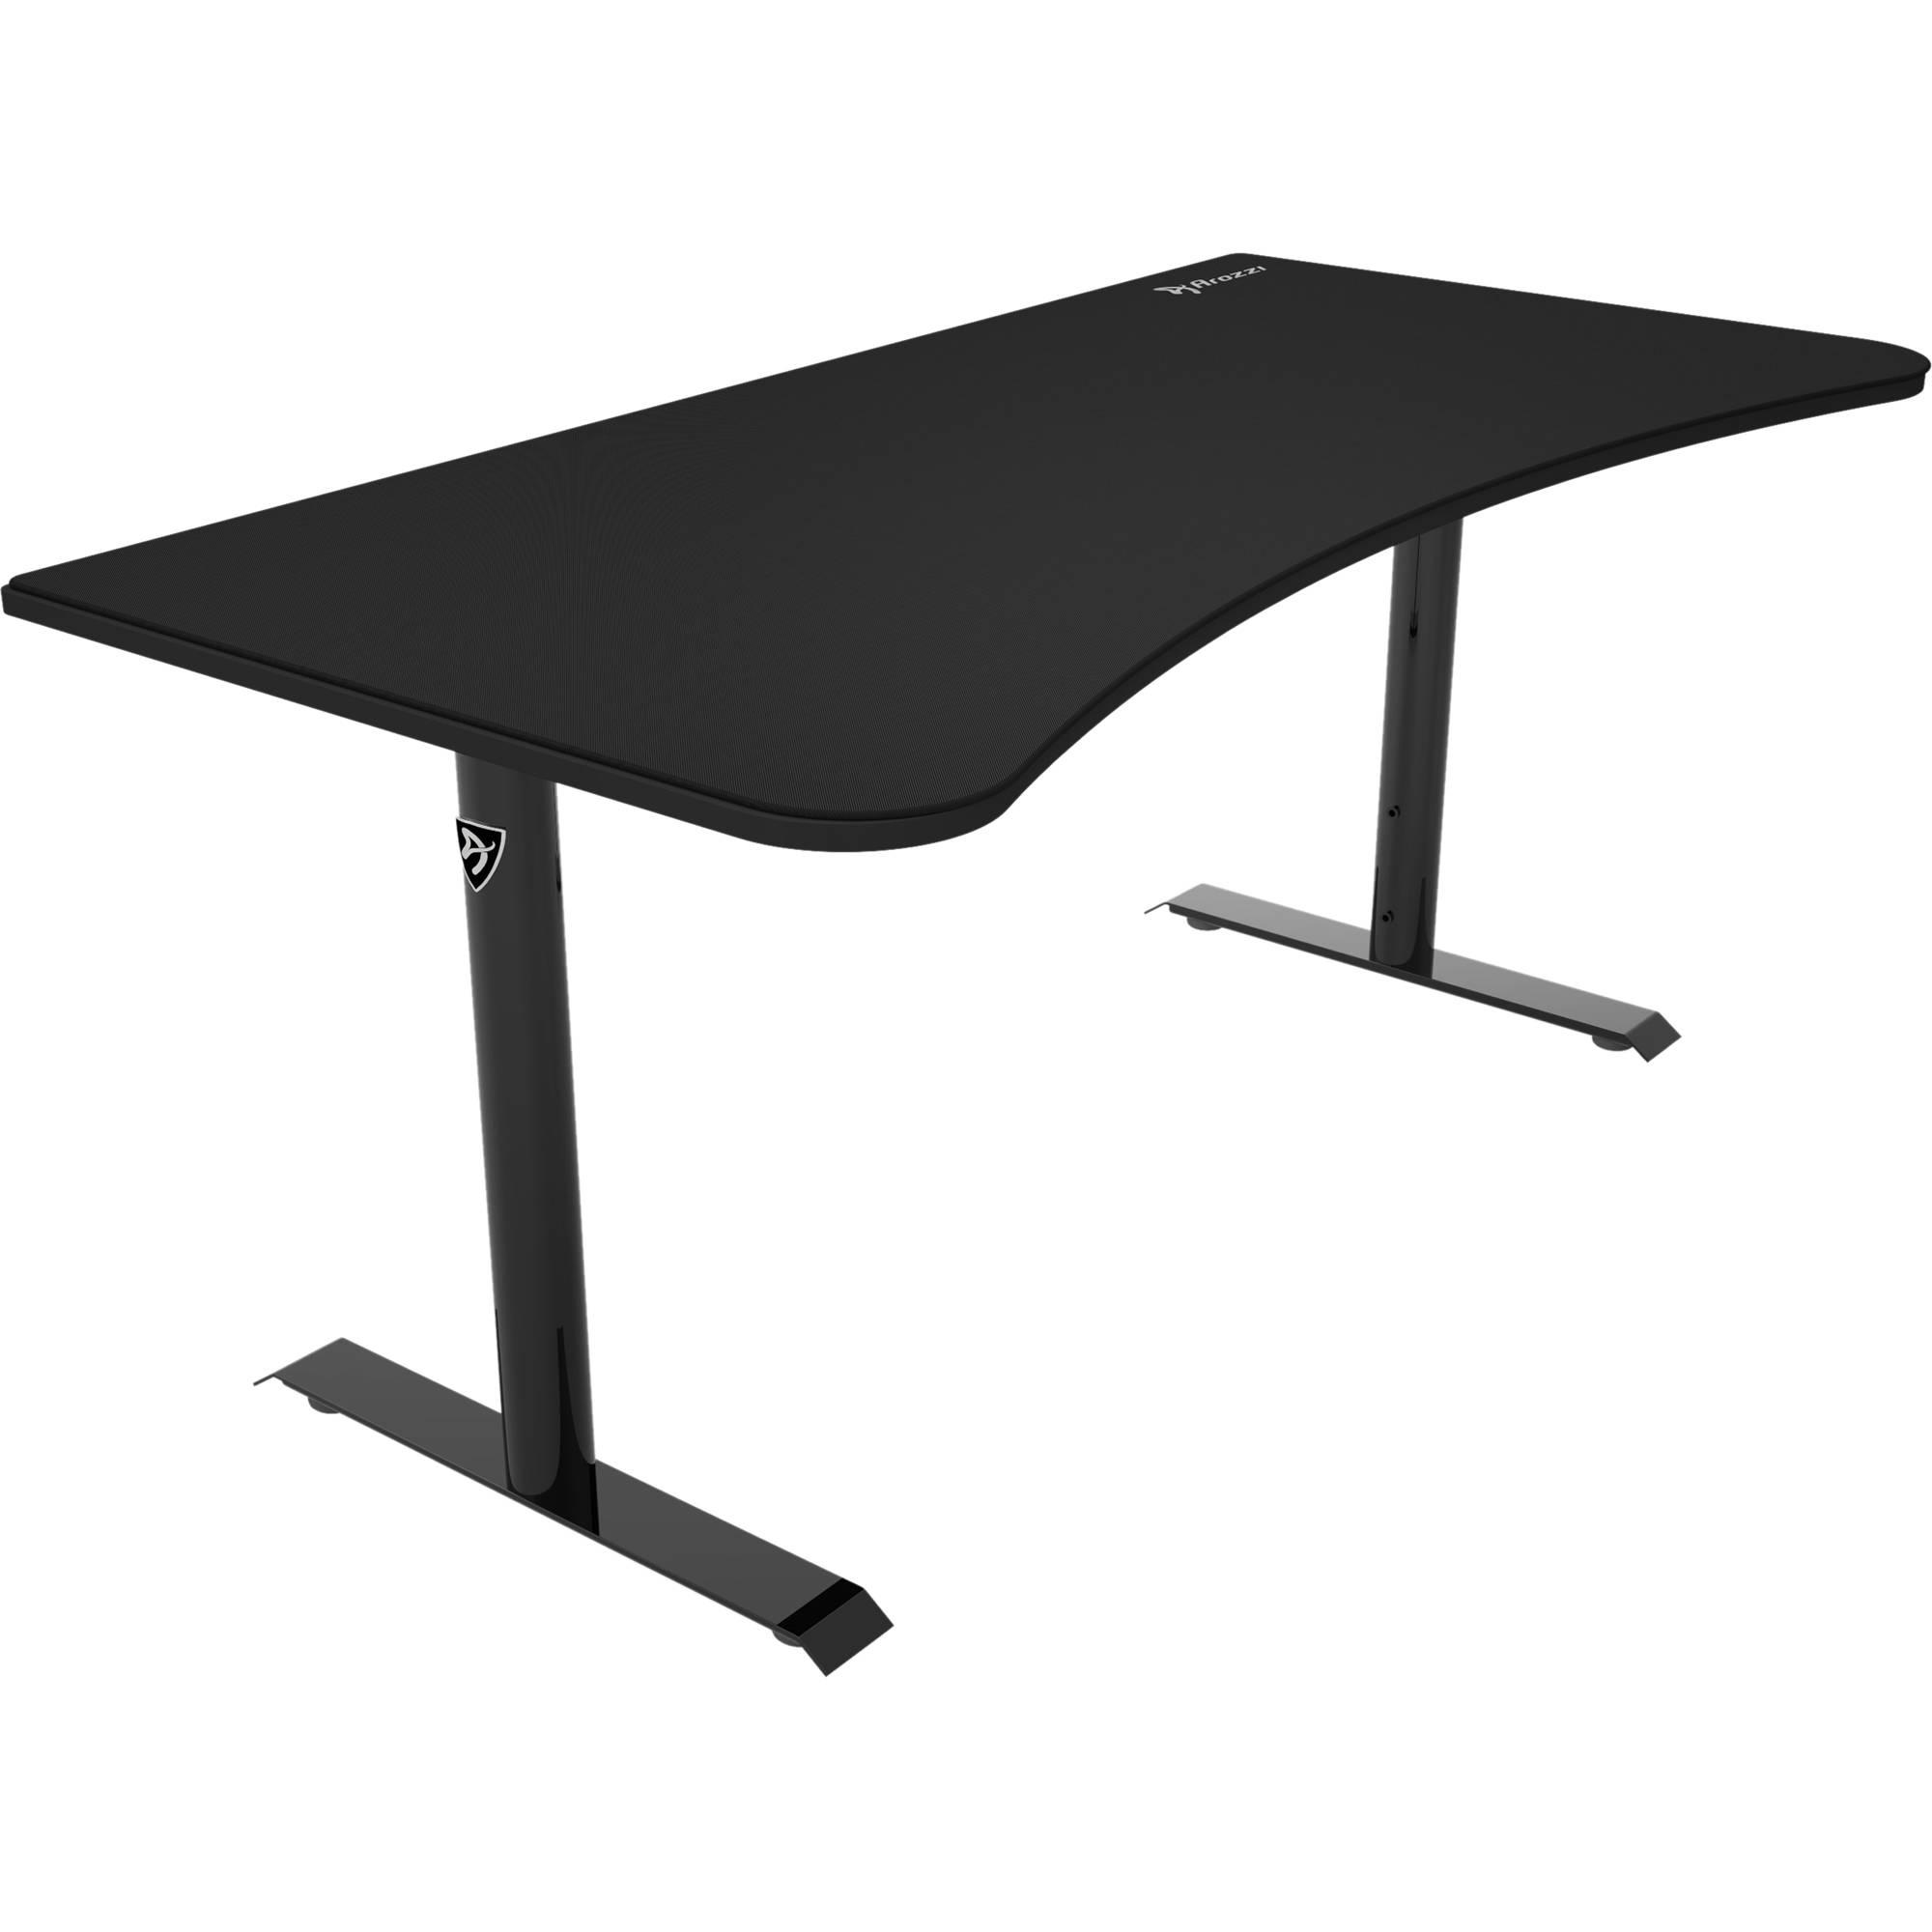 Ordinary Black Table Desk Part - 11: Arozzi Arena Gaming Desk (Pure Black)